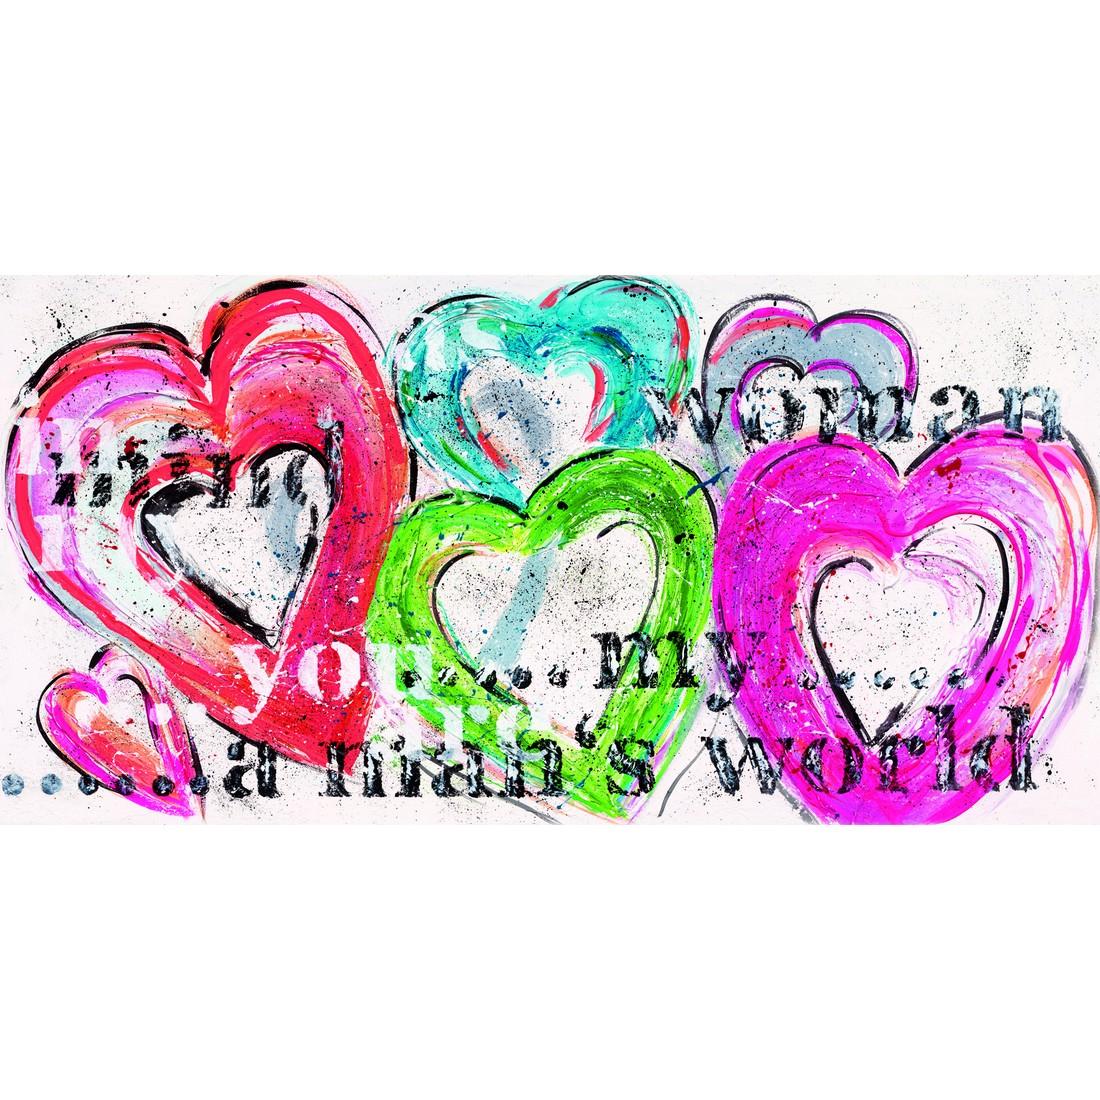 Leinwandbild Big Hearts -Rot, Rosa, Weiss, Bönninghoff günstig online kaufen